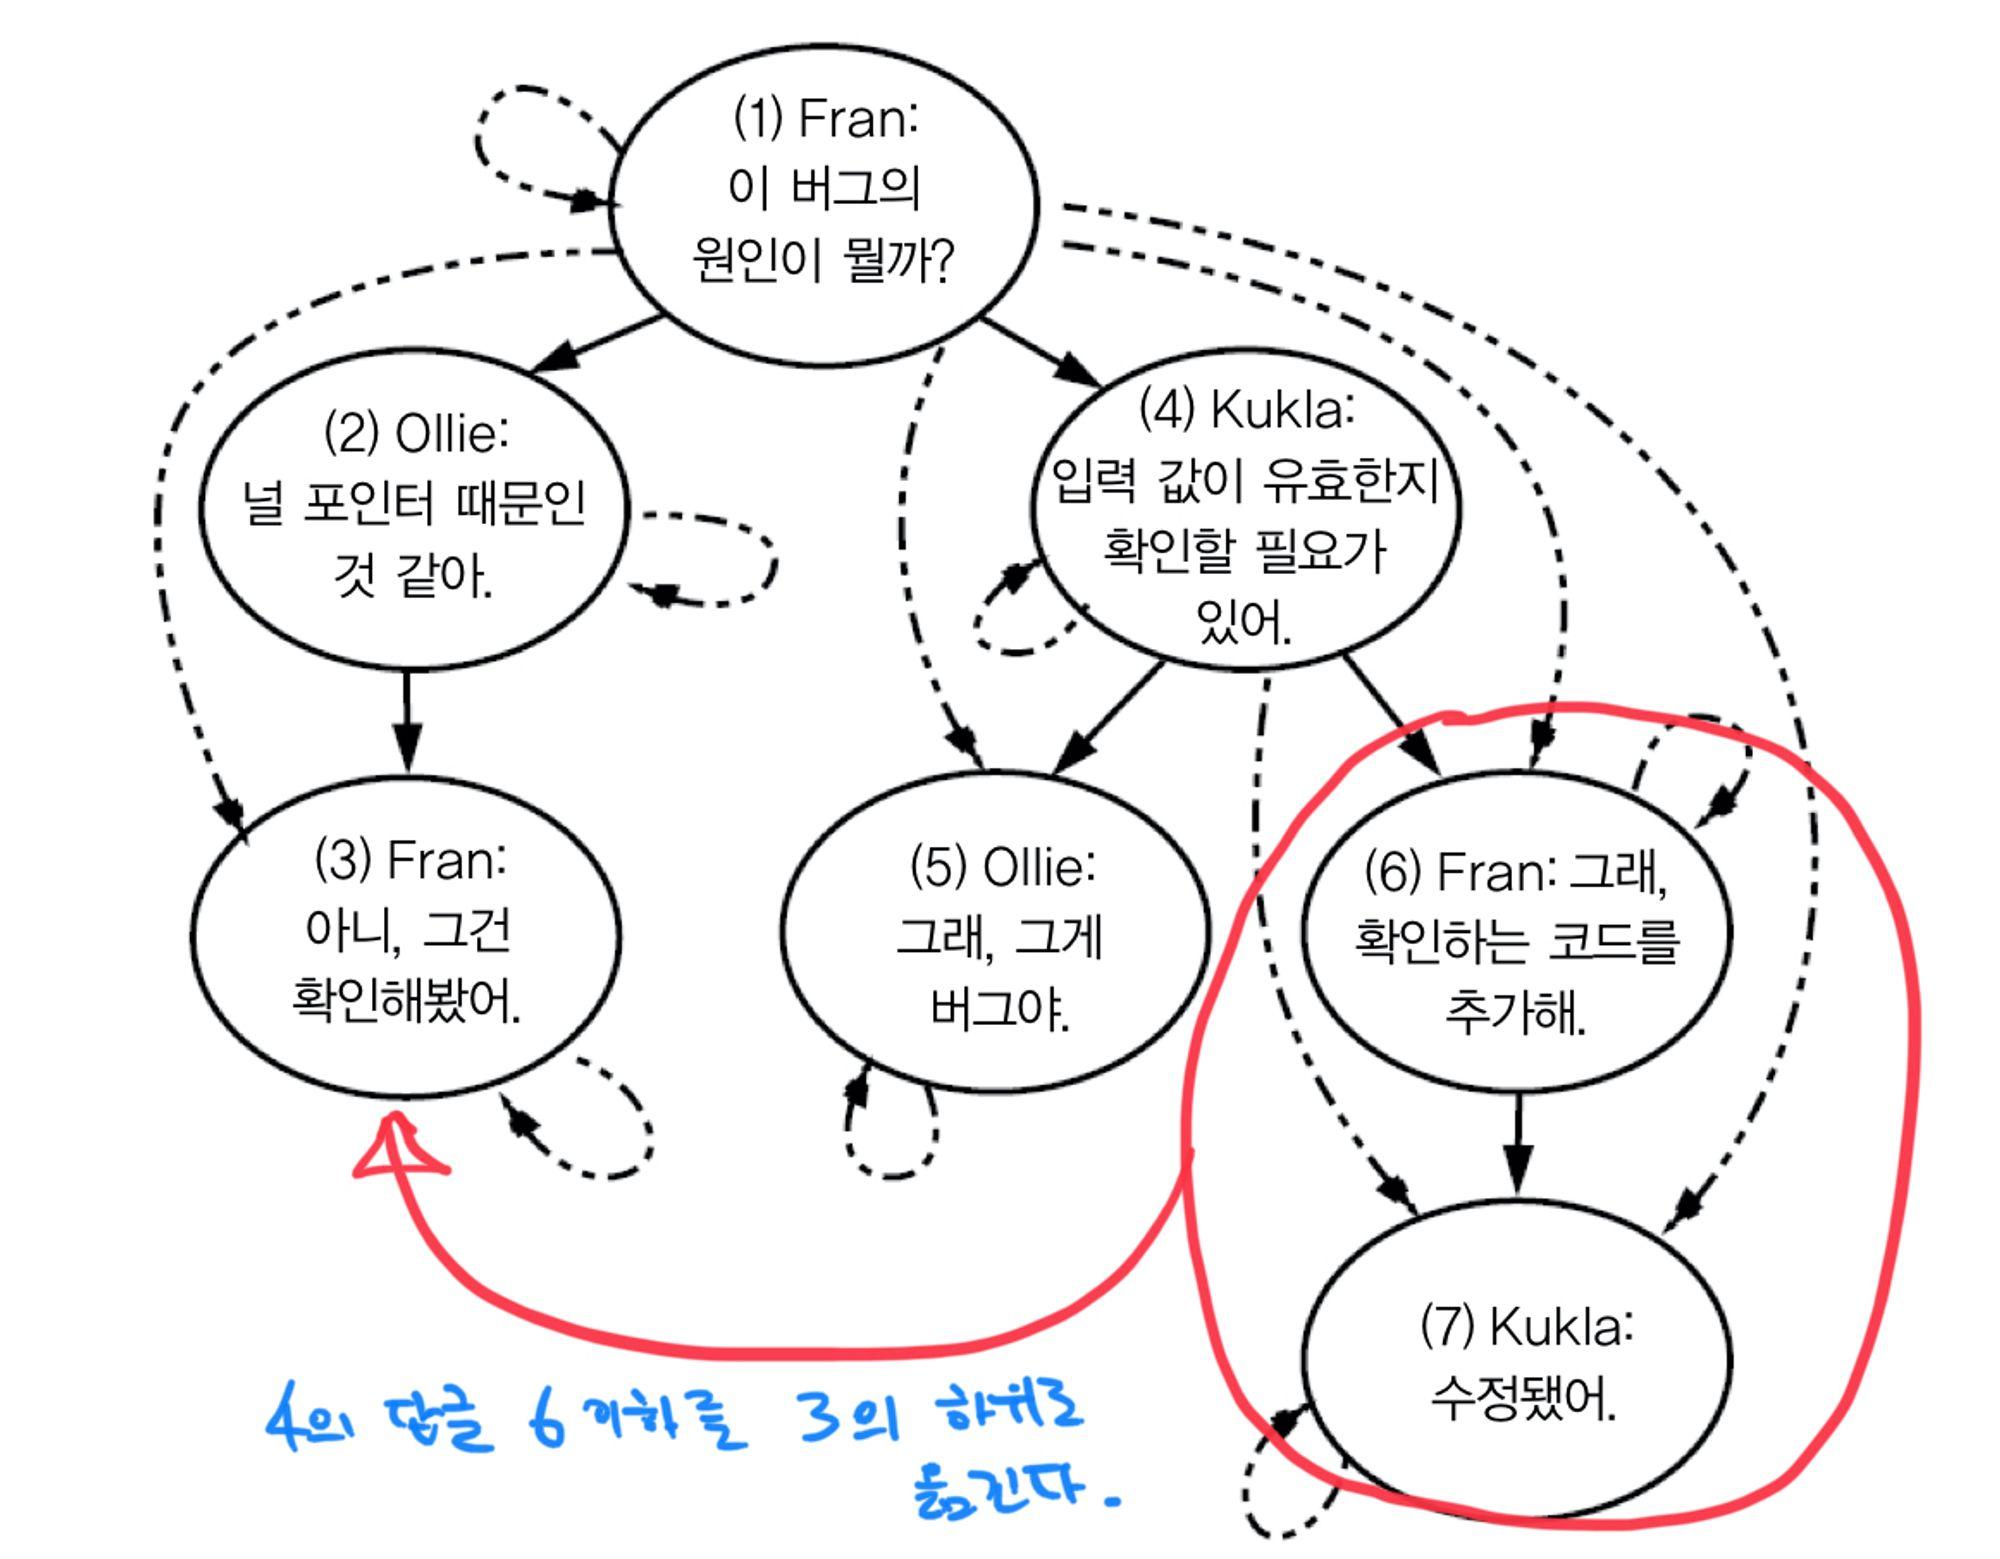 mysql-closure-table-hierarchy-save3.jpg